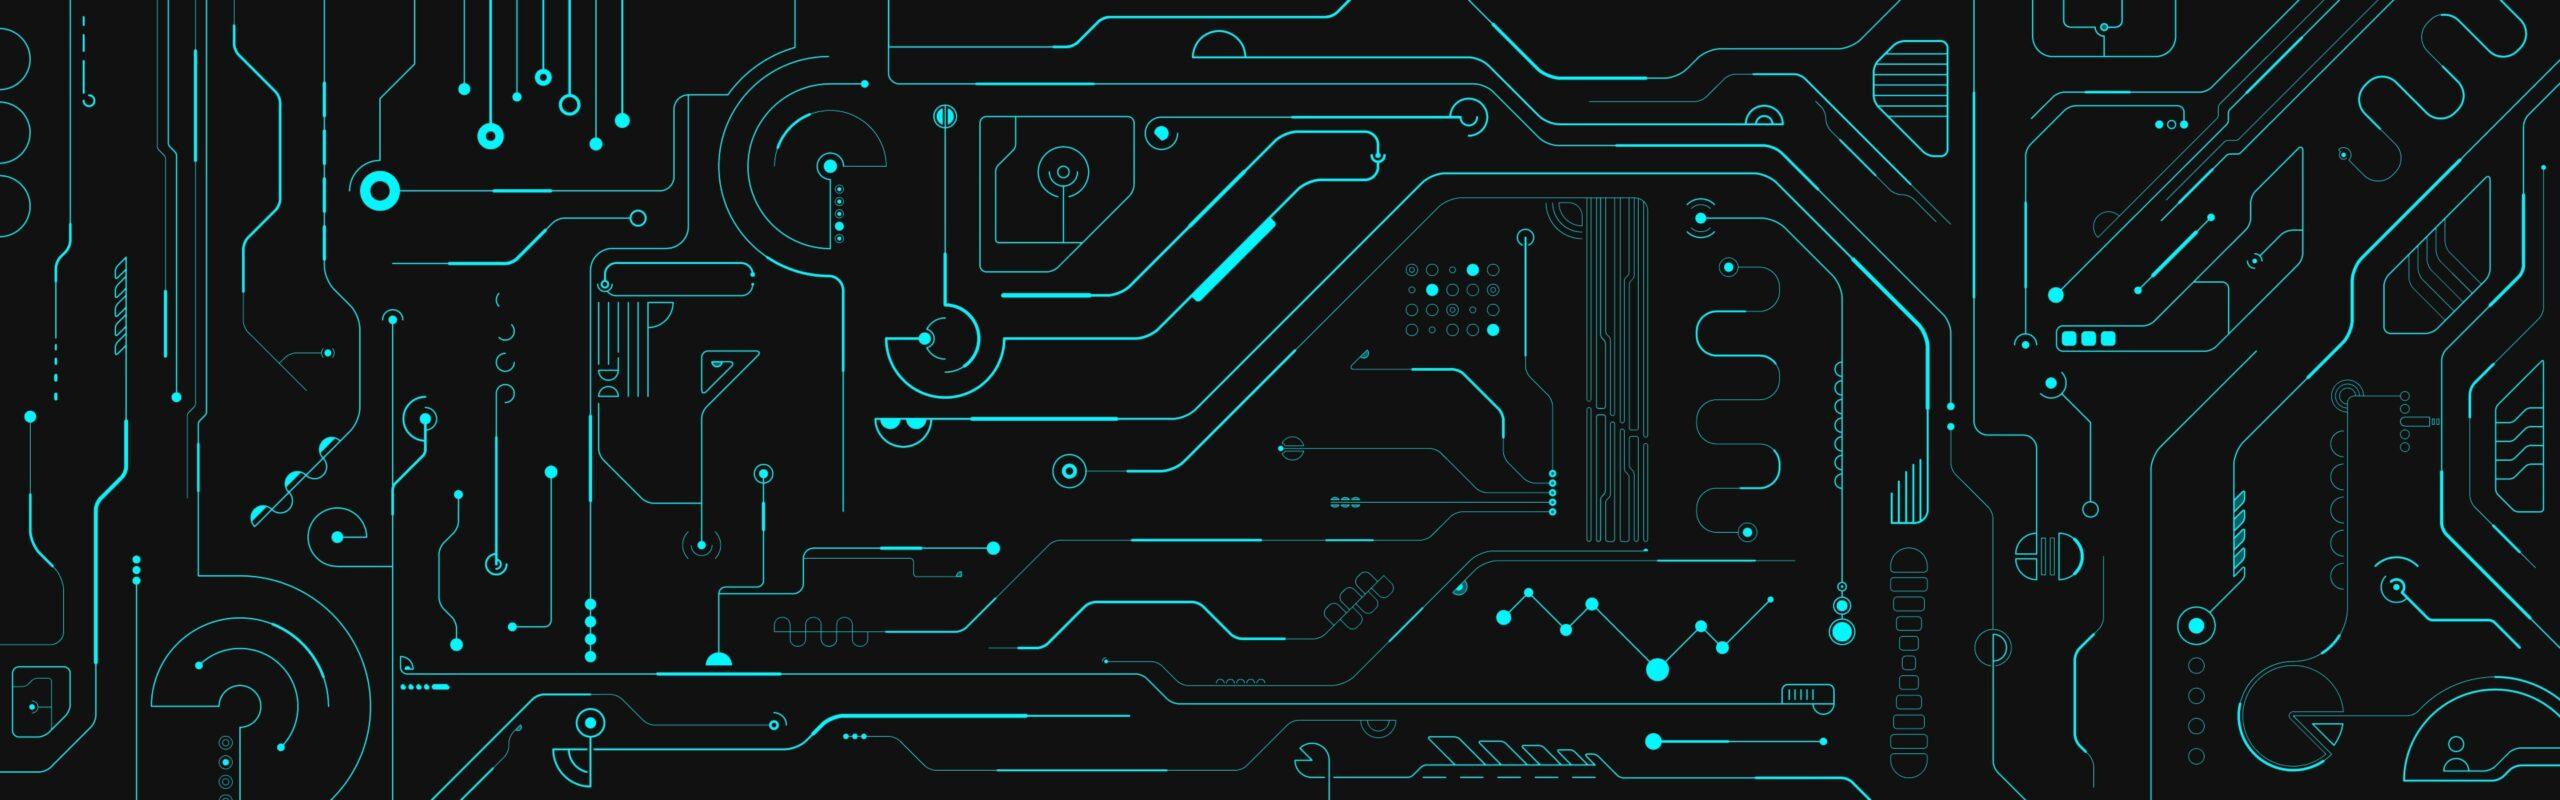 http://server.digimetriq.com/wp-content/uploads/2020/12/1609419435_78_50-HD-Dual-Monitor-Wallpaper-For-PC-2021.jpeg